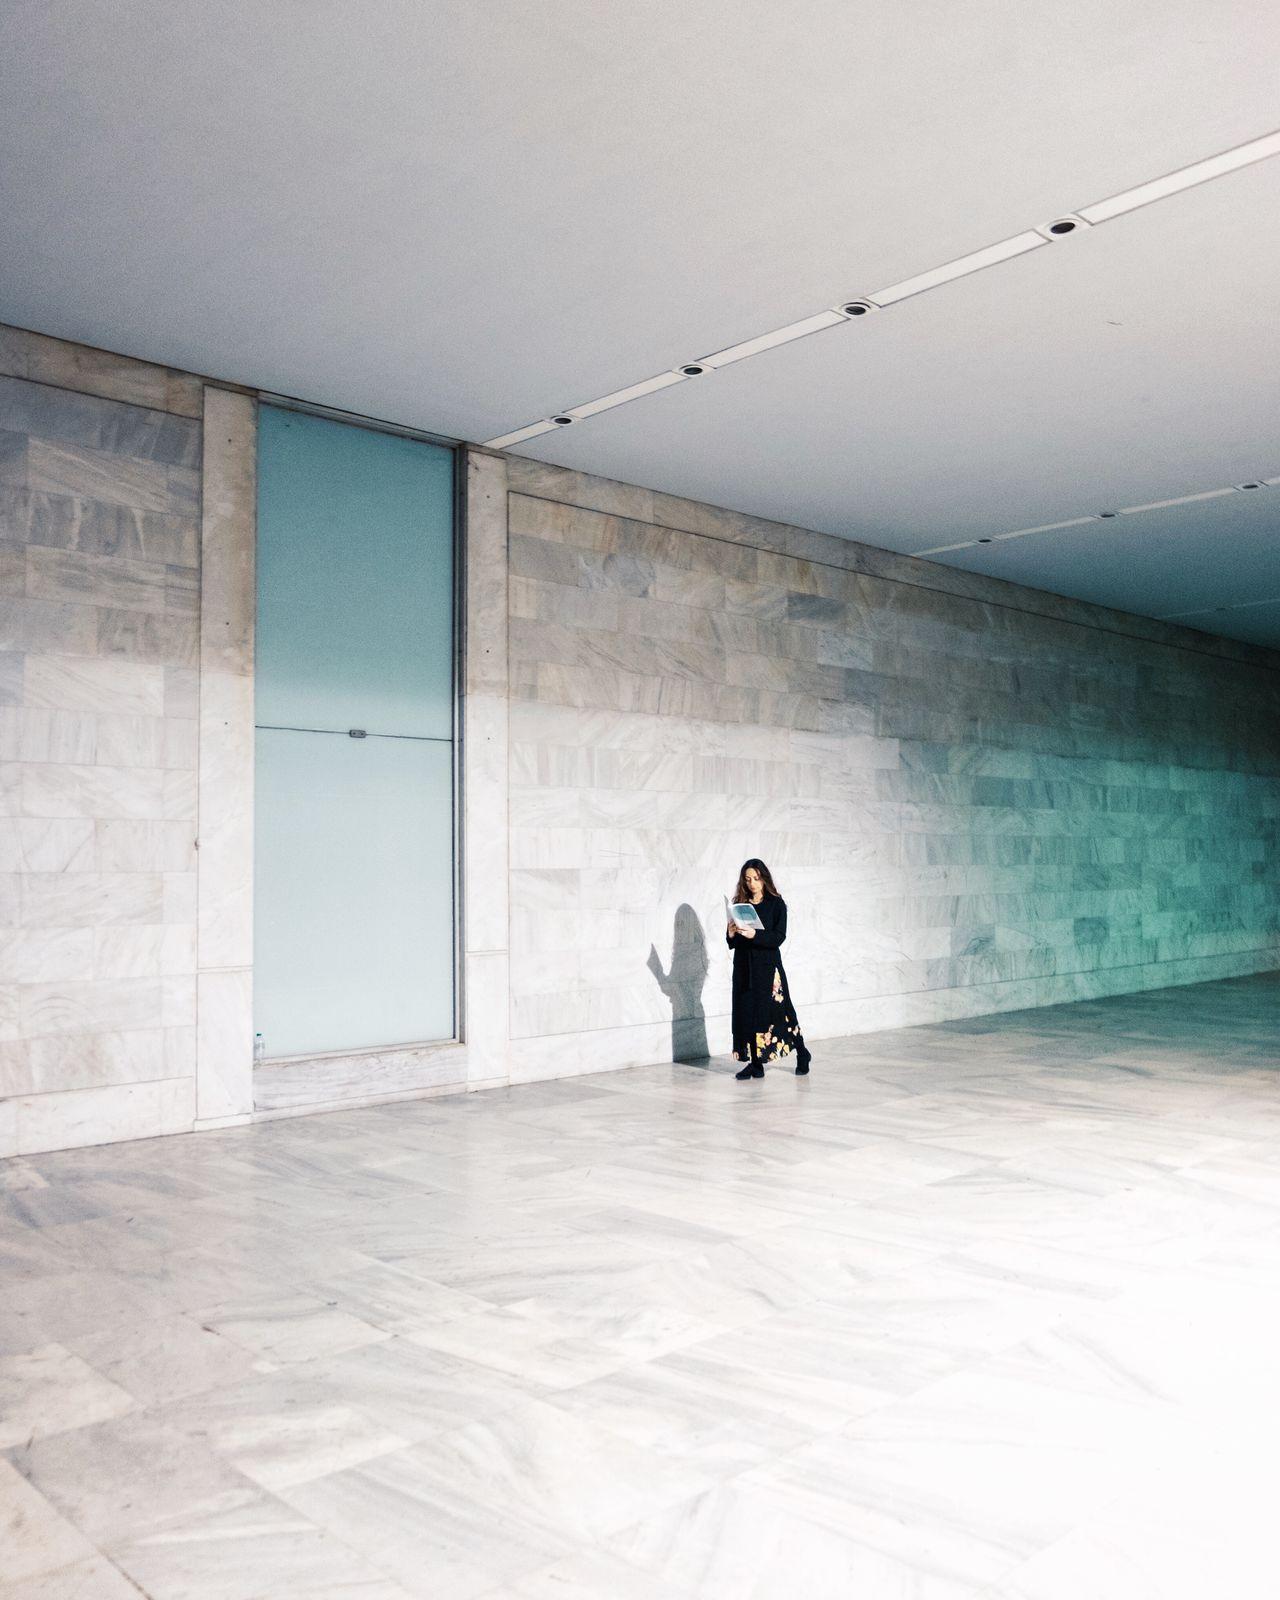 Woman reading book while walking in corridor